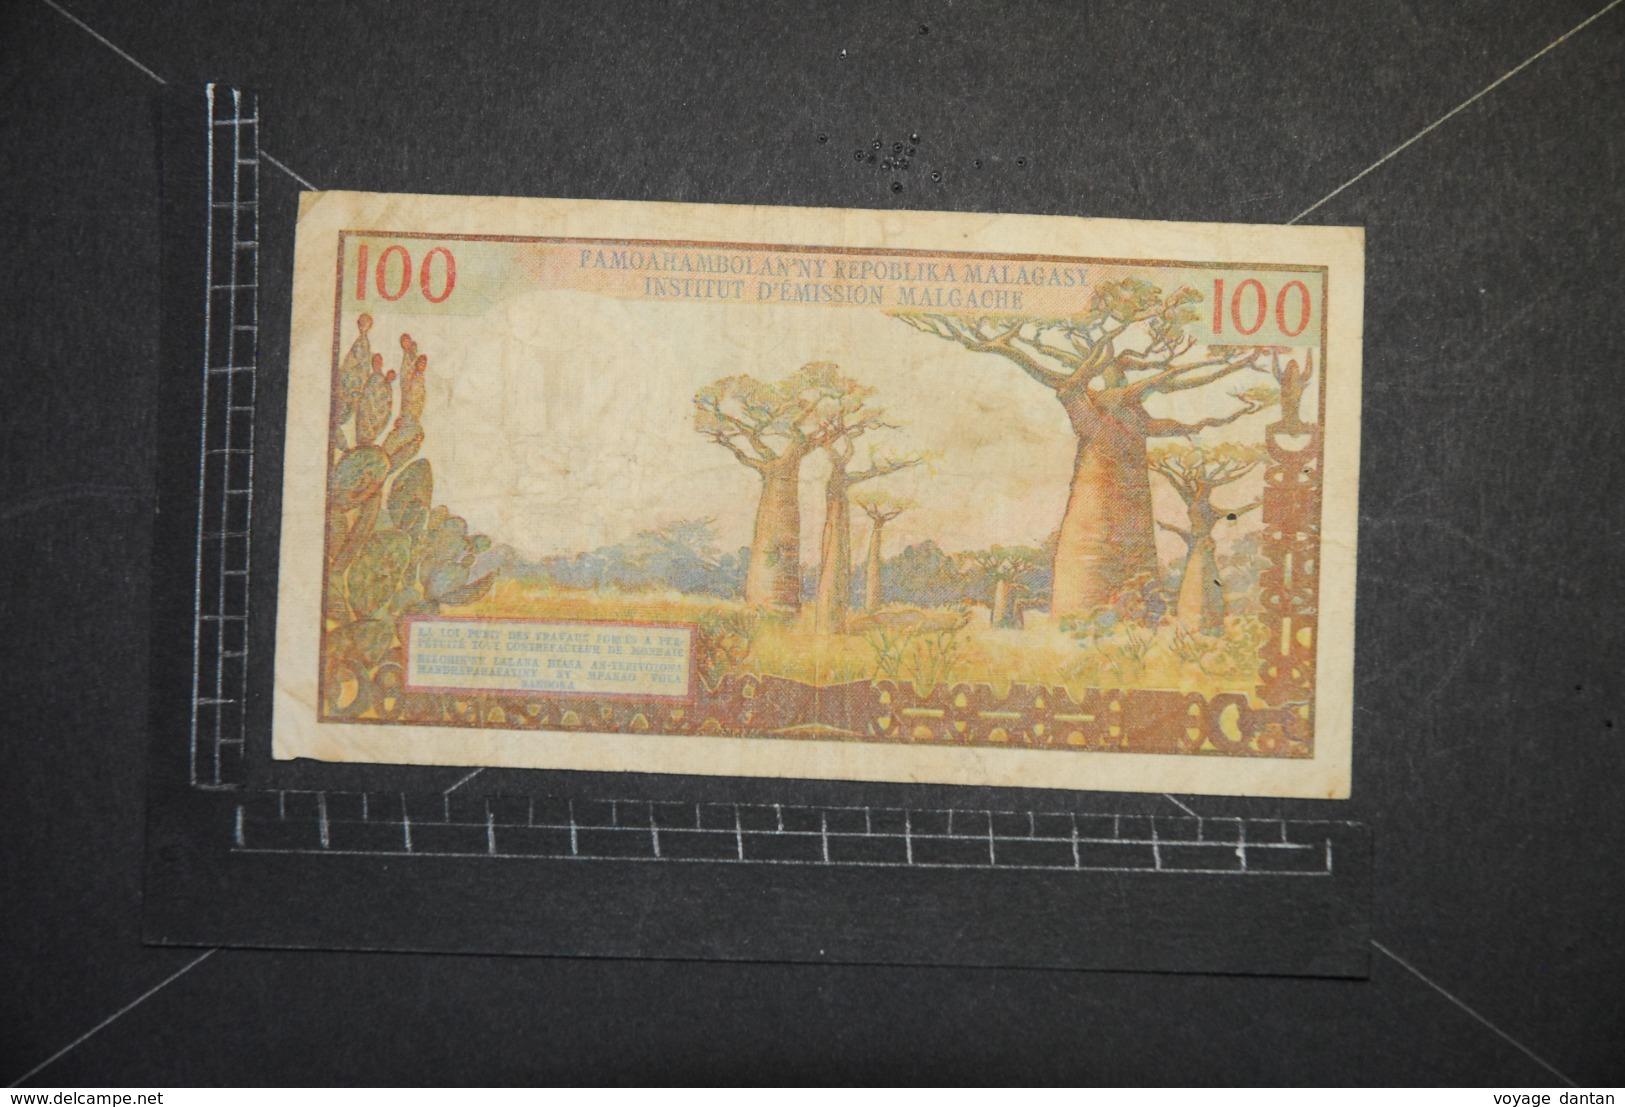 Billet, MADAGASCAR, 100 Francs Institut D'emission Malgache R.26 14863 Non Daté 1966 - Madagascar